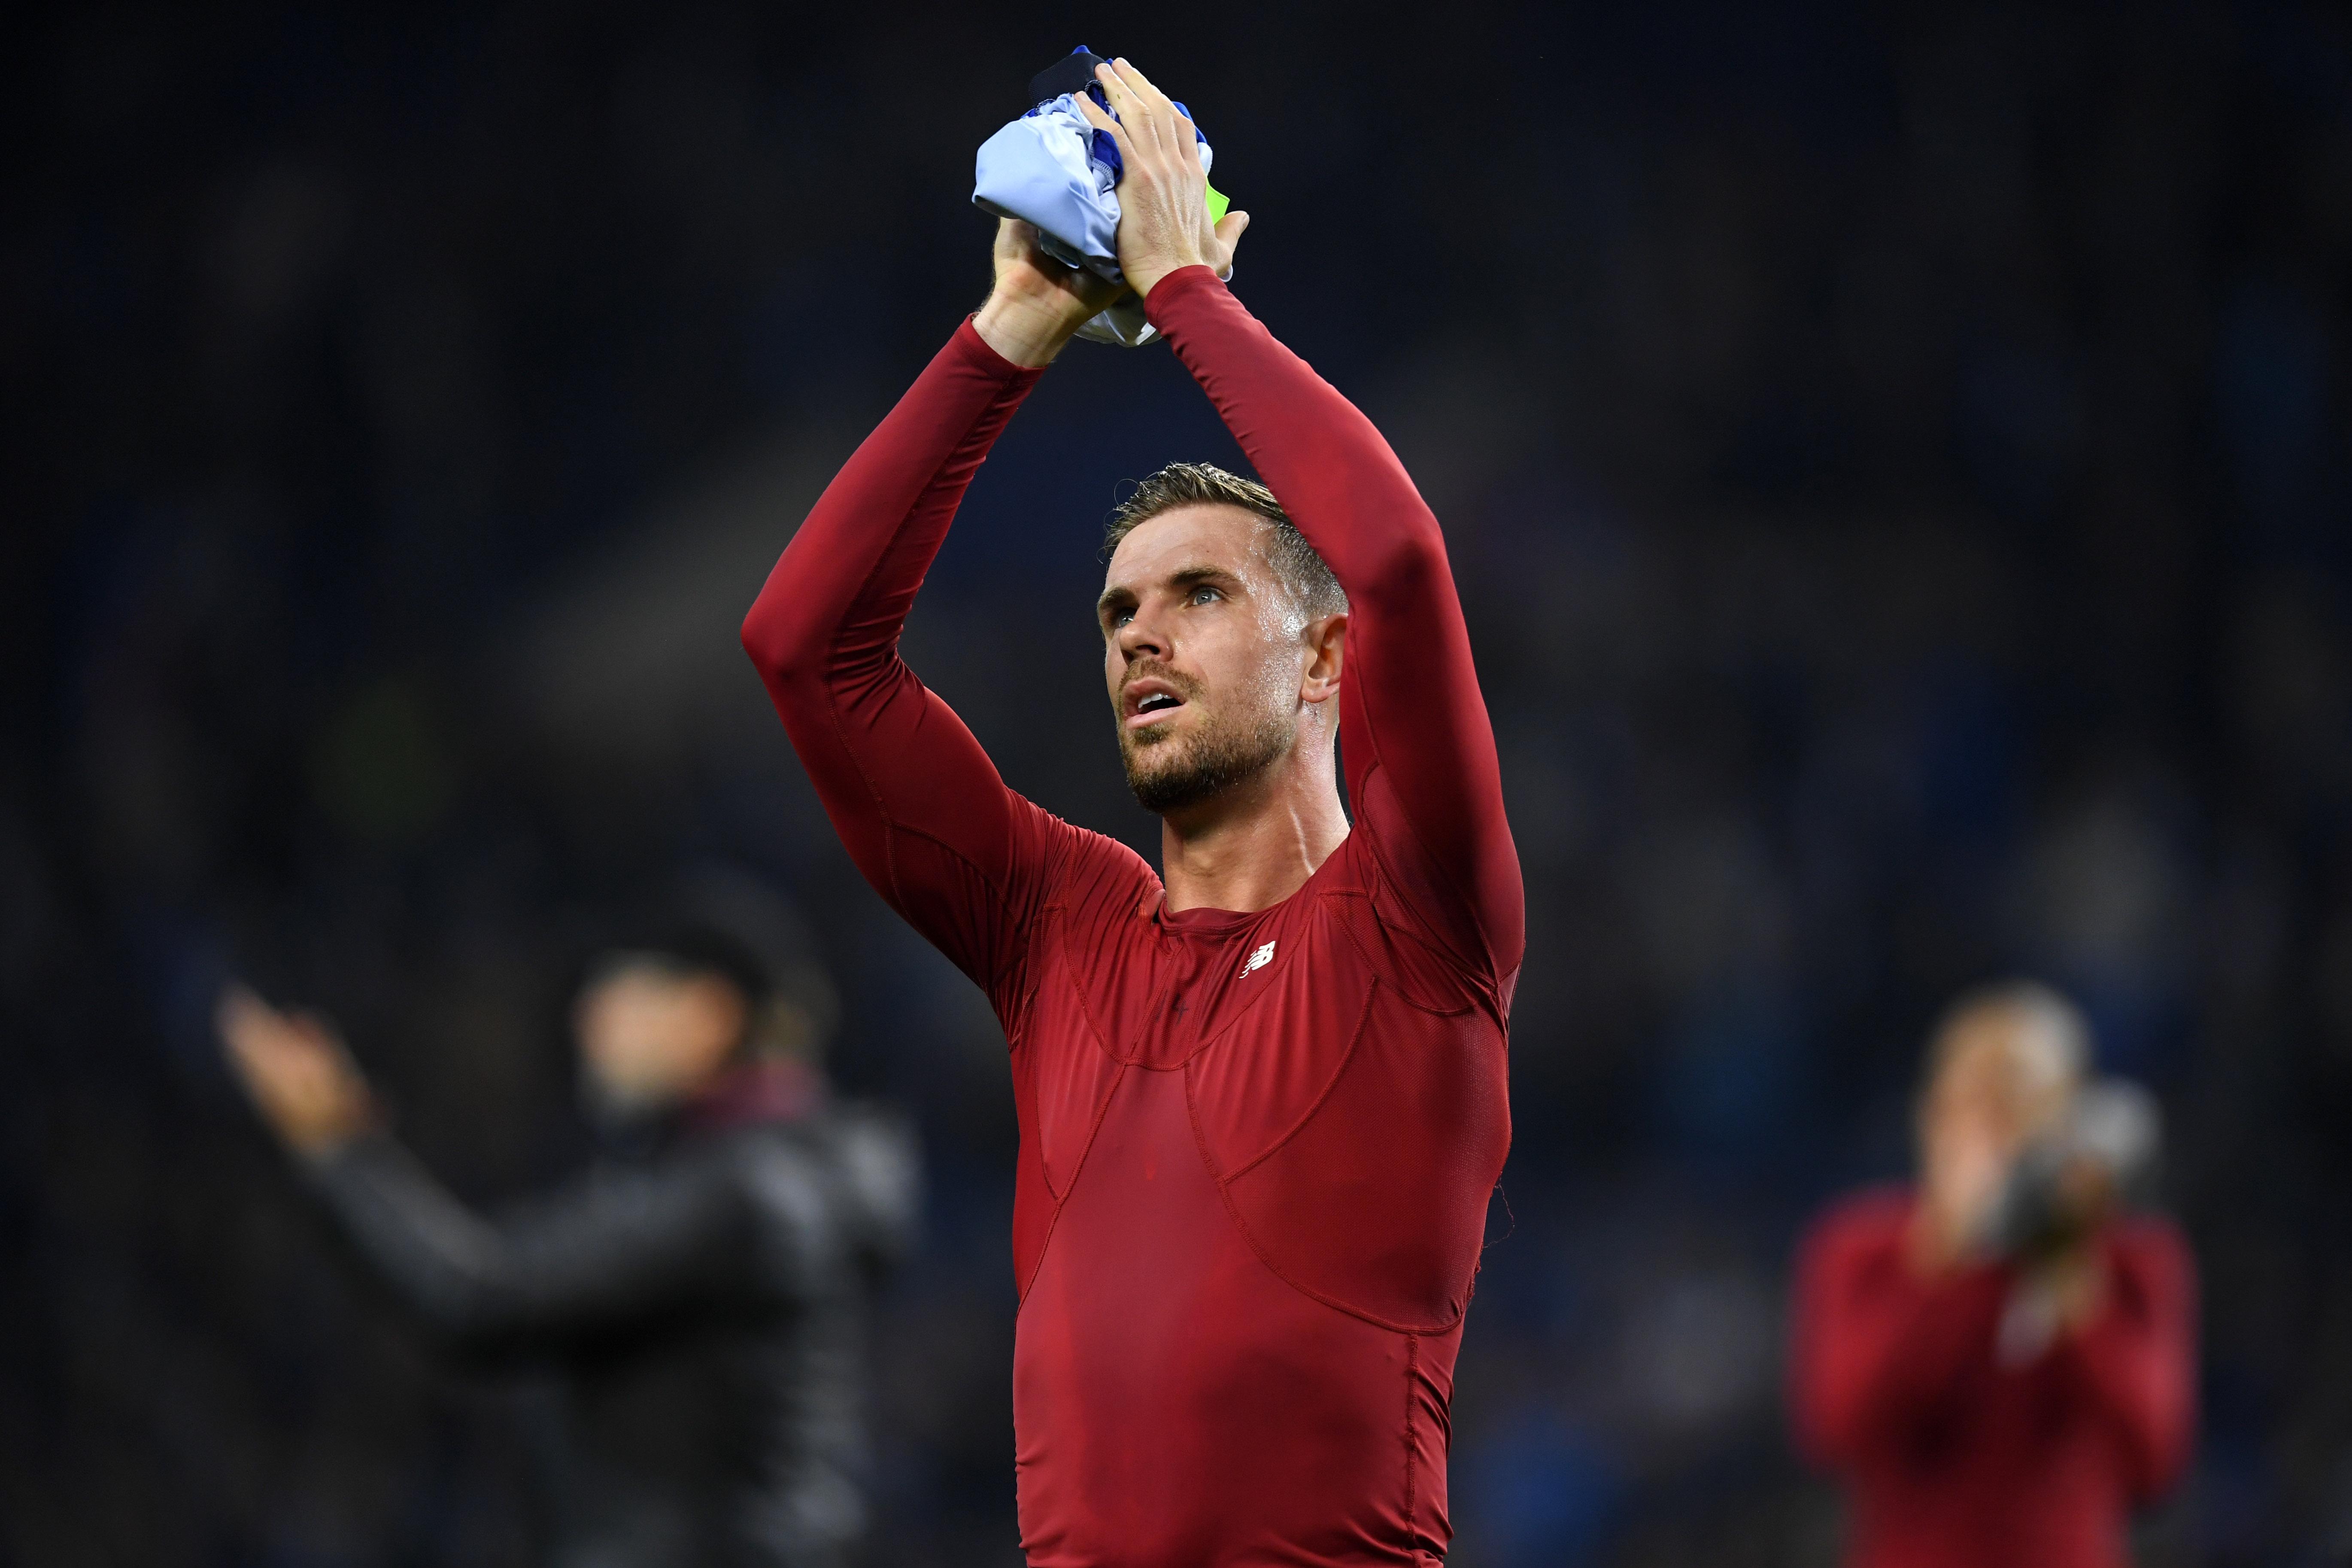 Jordan Henderson on Porto Win: The Lads Dug In